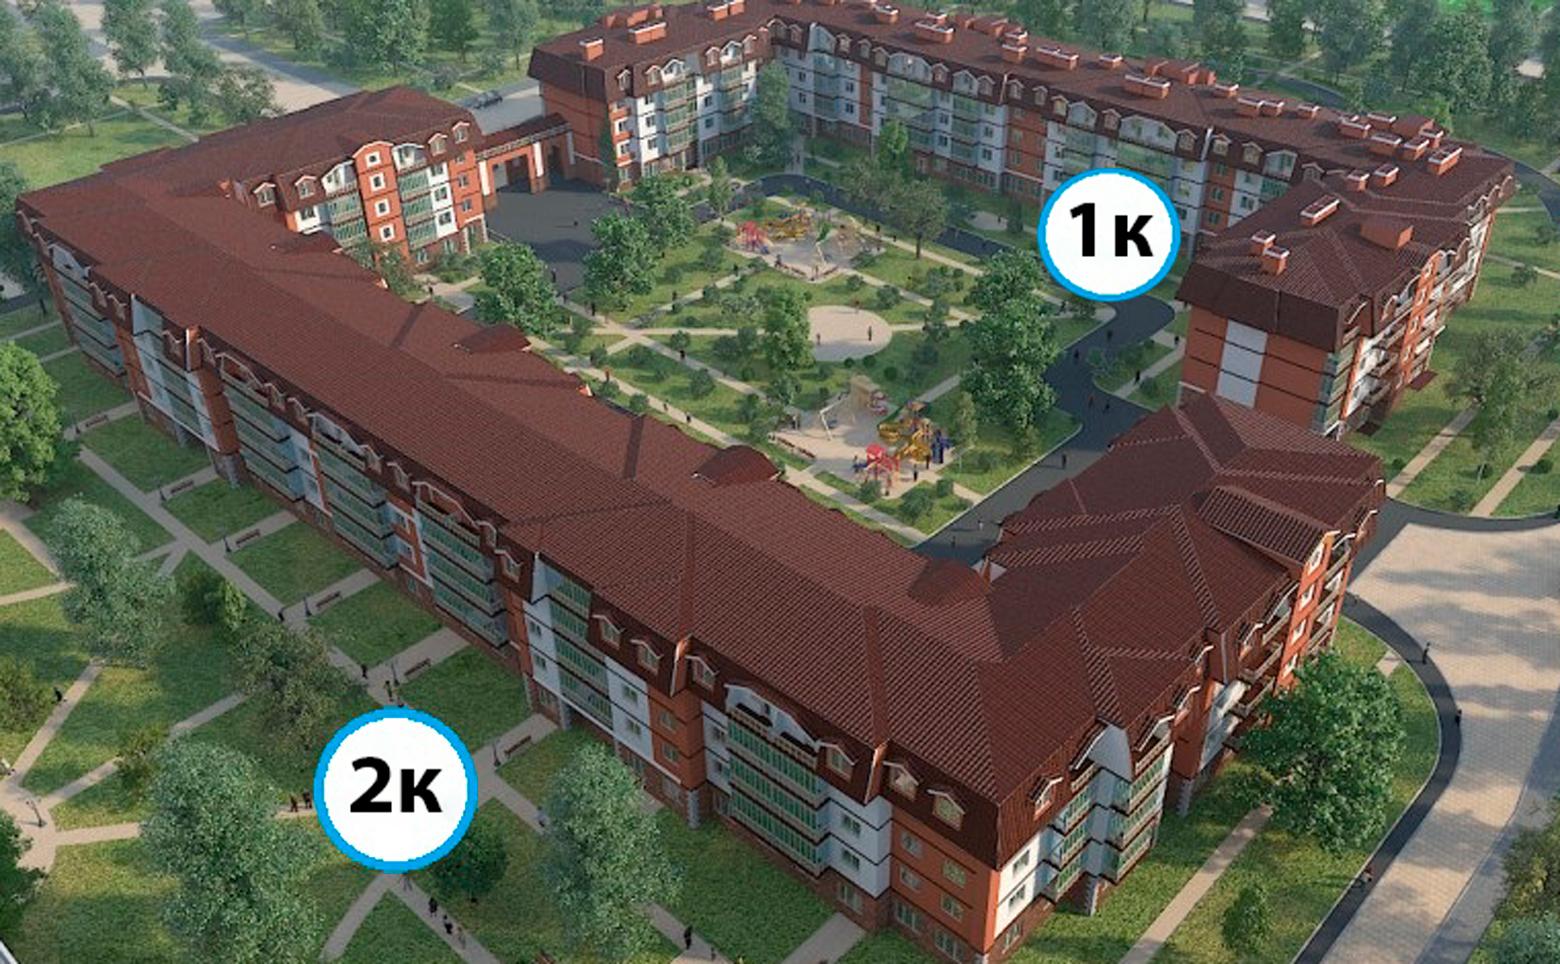 План жилого комплекса ЖК Царский двор